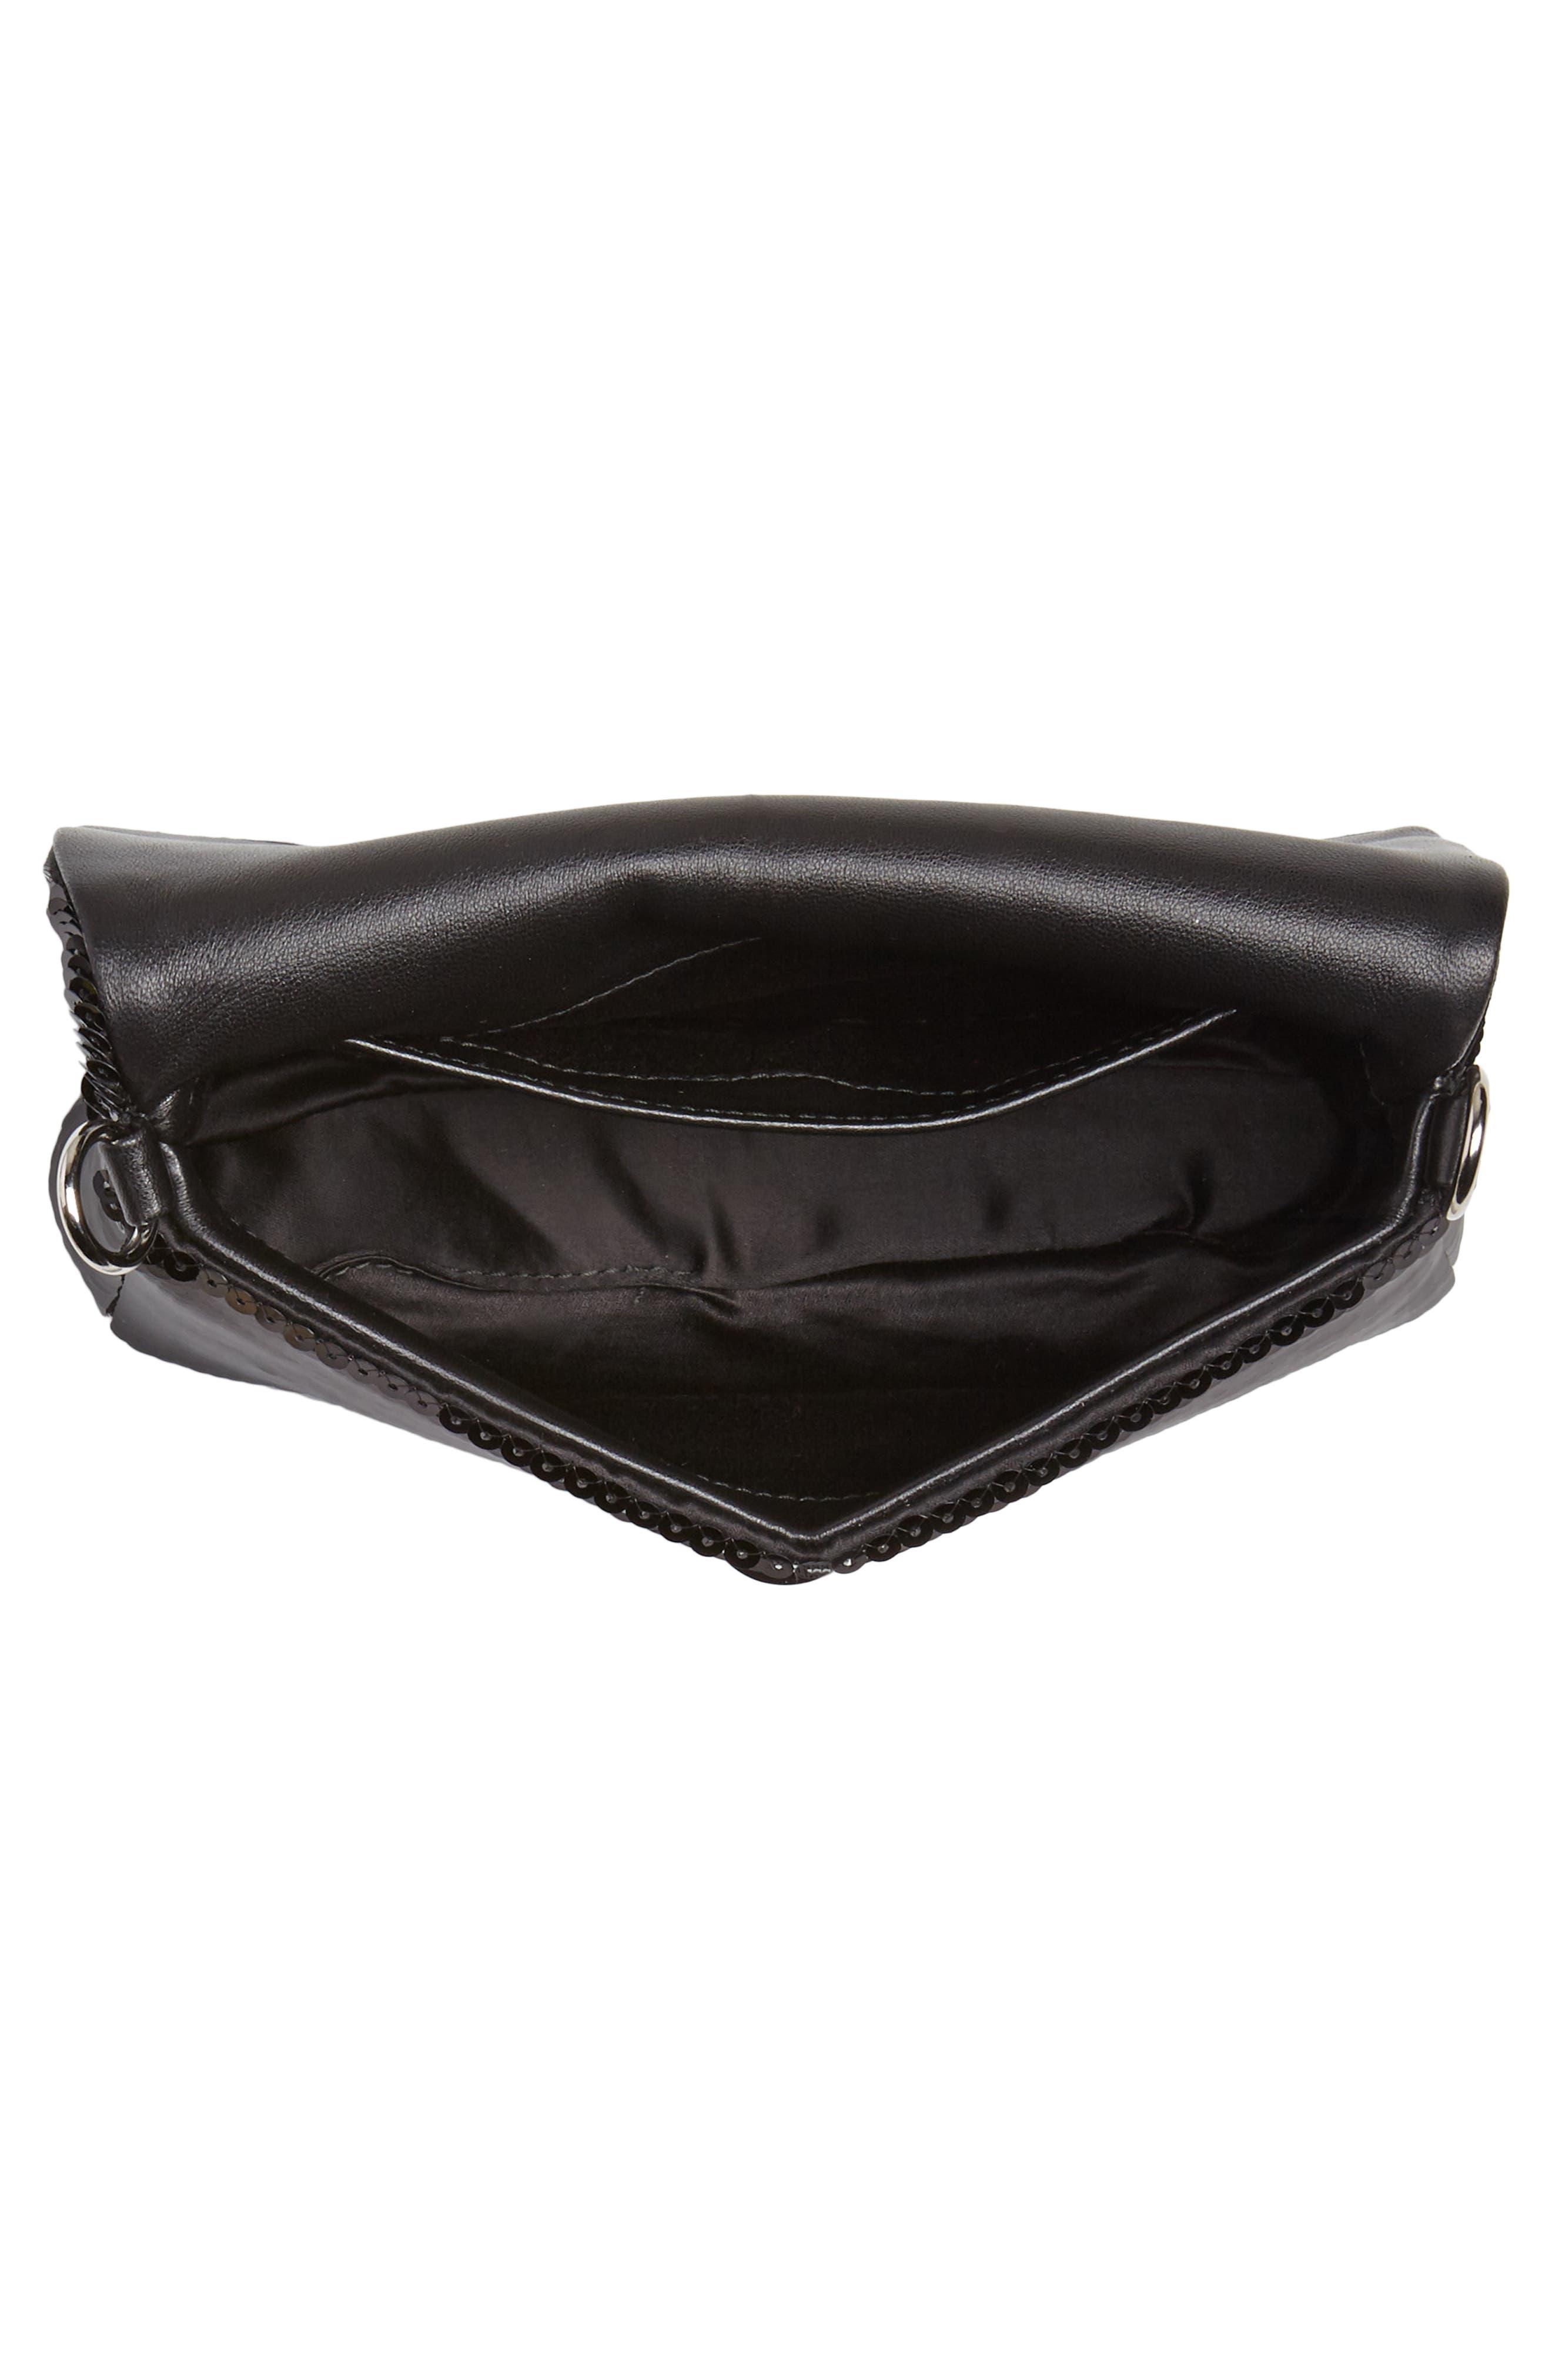 Paillettes Flap Crossbody Bag,                             Alternate thumbnail 5, color,                             NERO